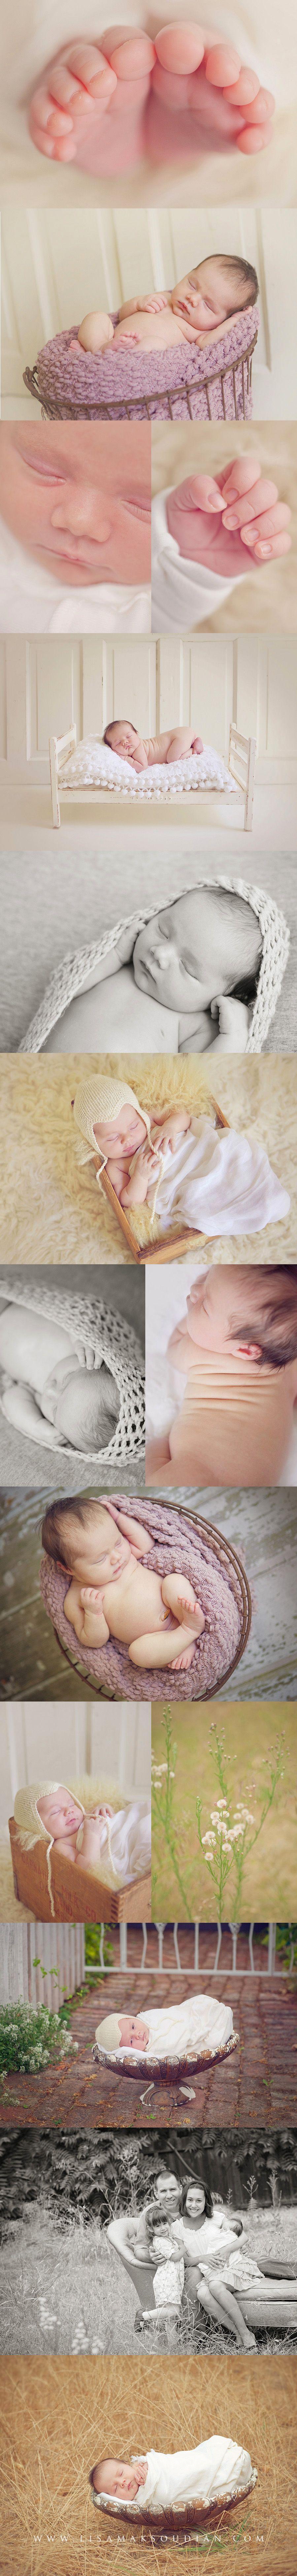 swoon worthy newborn session!